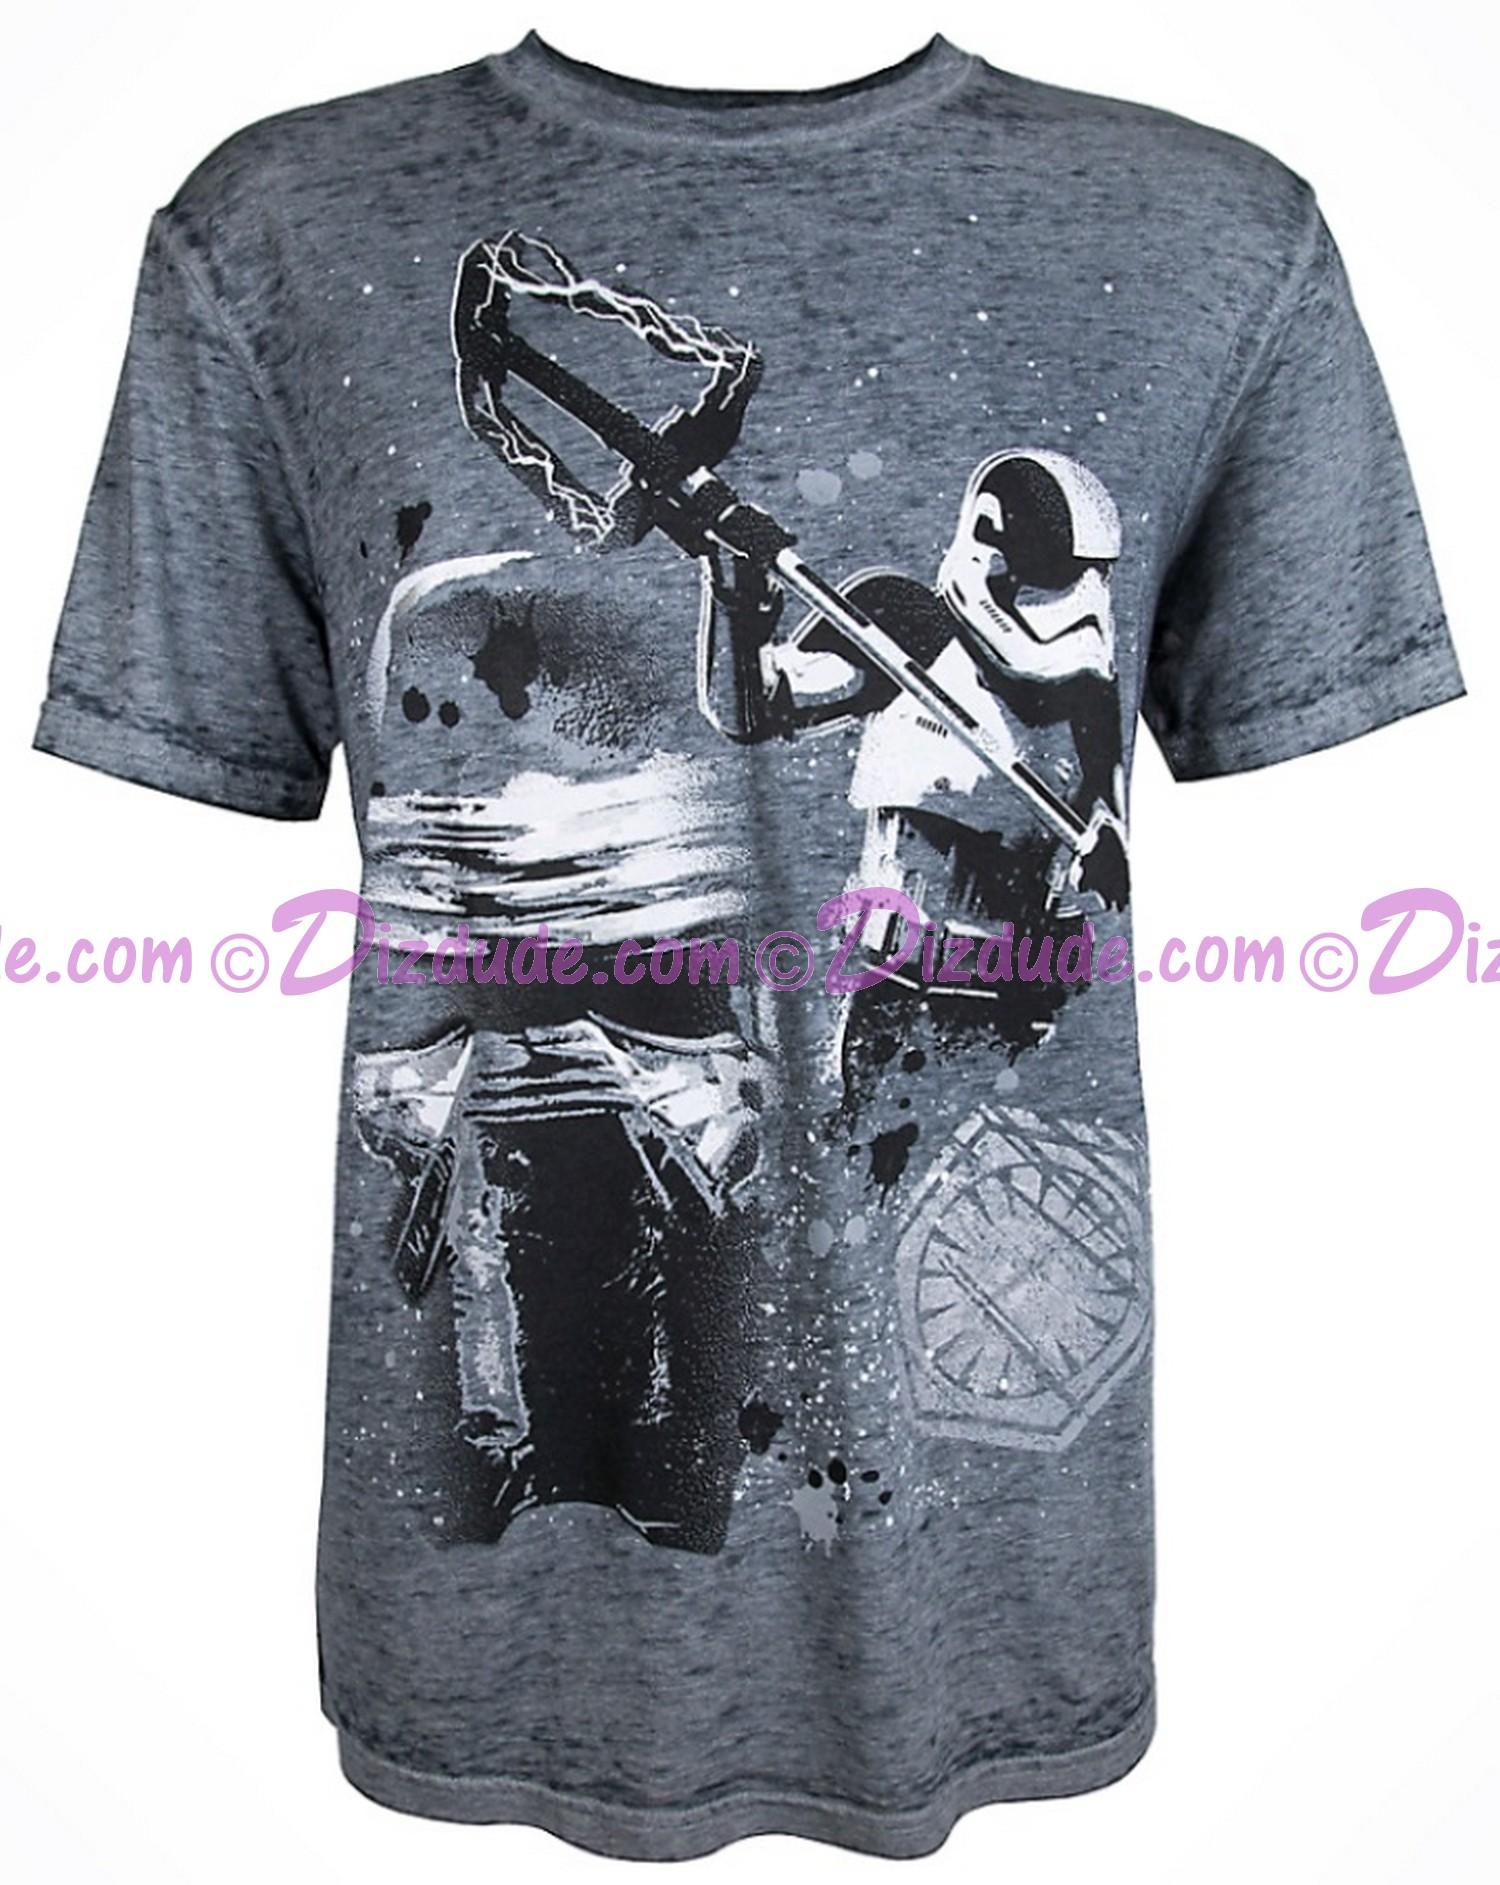 First Order Executioner Trooper Adult T-Shirt (Tshirt, T shirt or Tee) - Disney Star Wars Episode VIII: The Last Jedi  © Dizdude.com